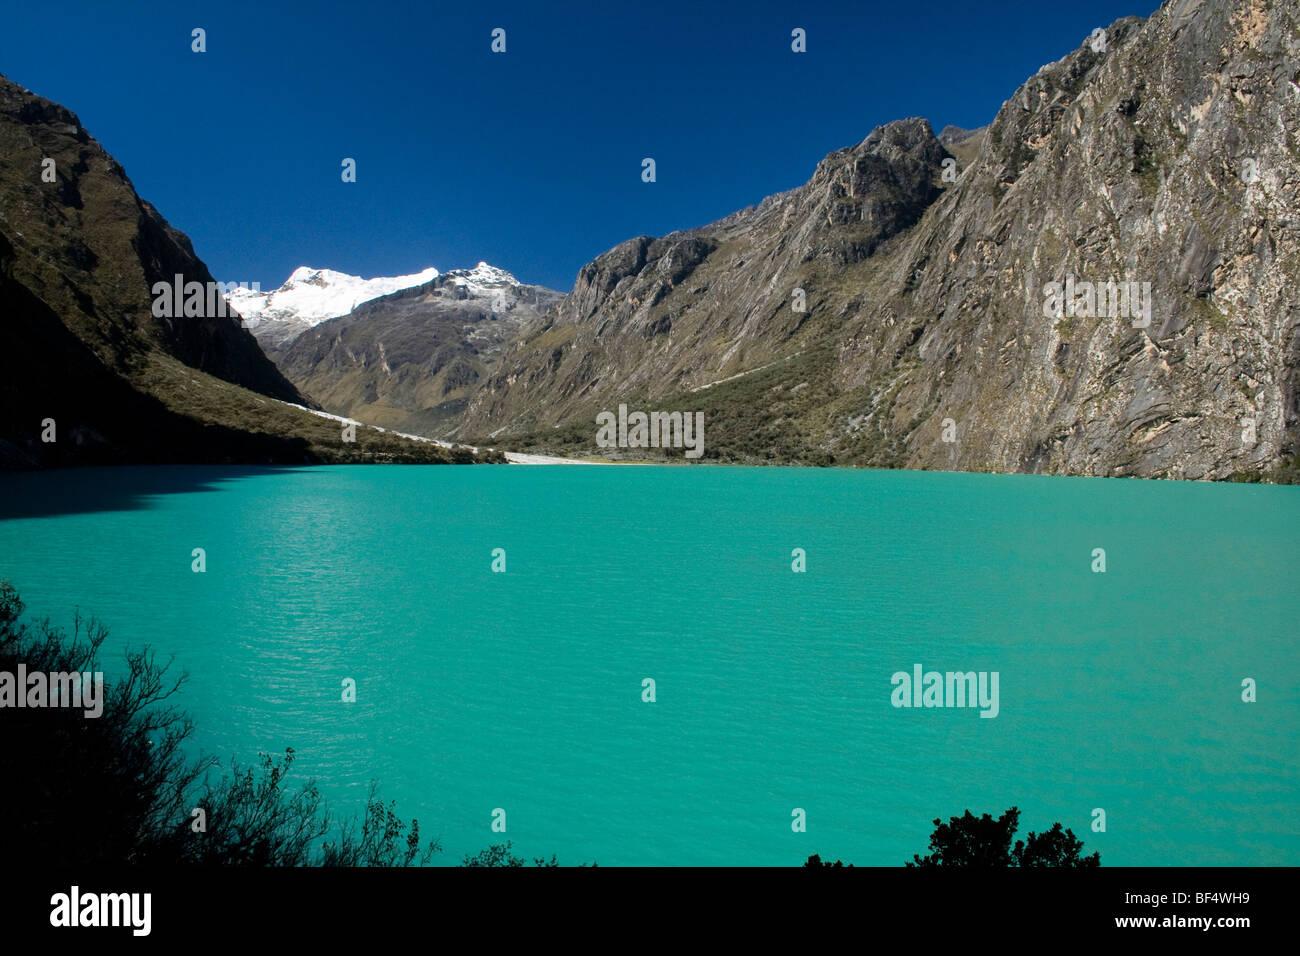 Lagune de llanganuco in Parque nacional Huascaran, Peru Cordileria. Deep blue green colour against snowy mountain - Stock Image